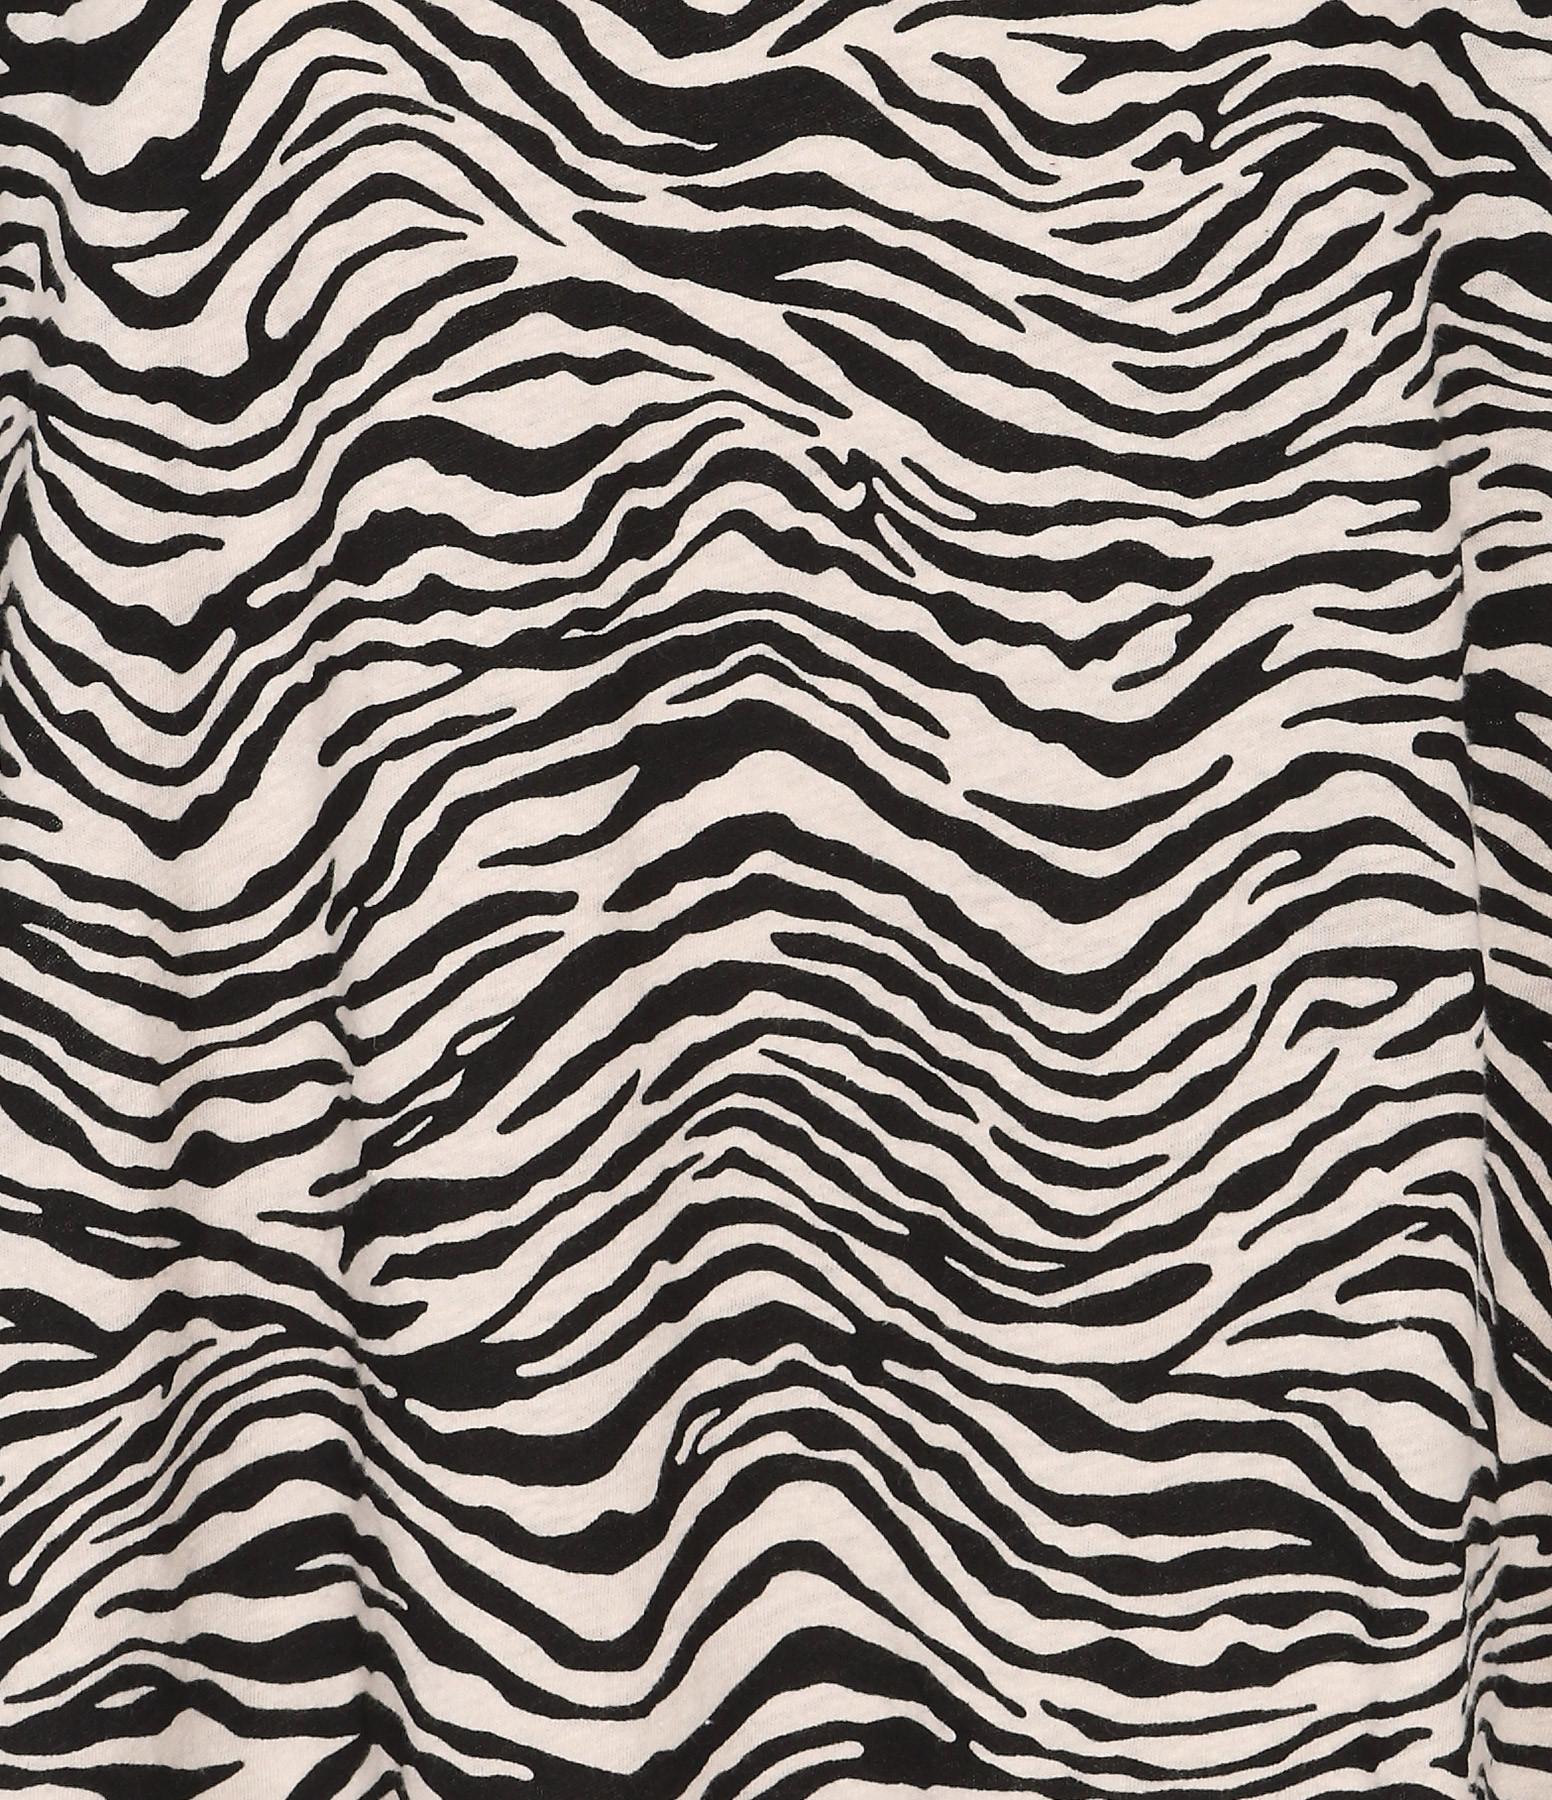 JUNE 7.2 - Tee-shirt Yann Zebra Sable Noir